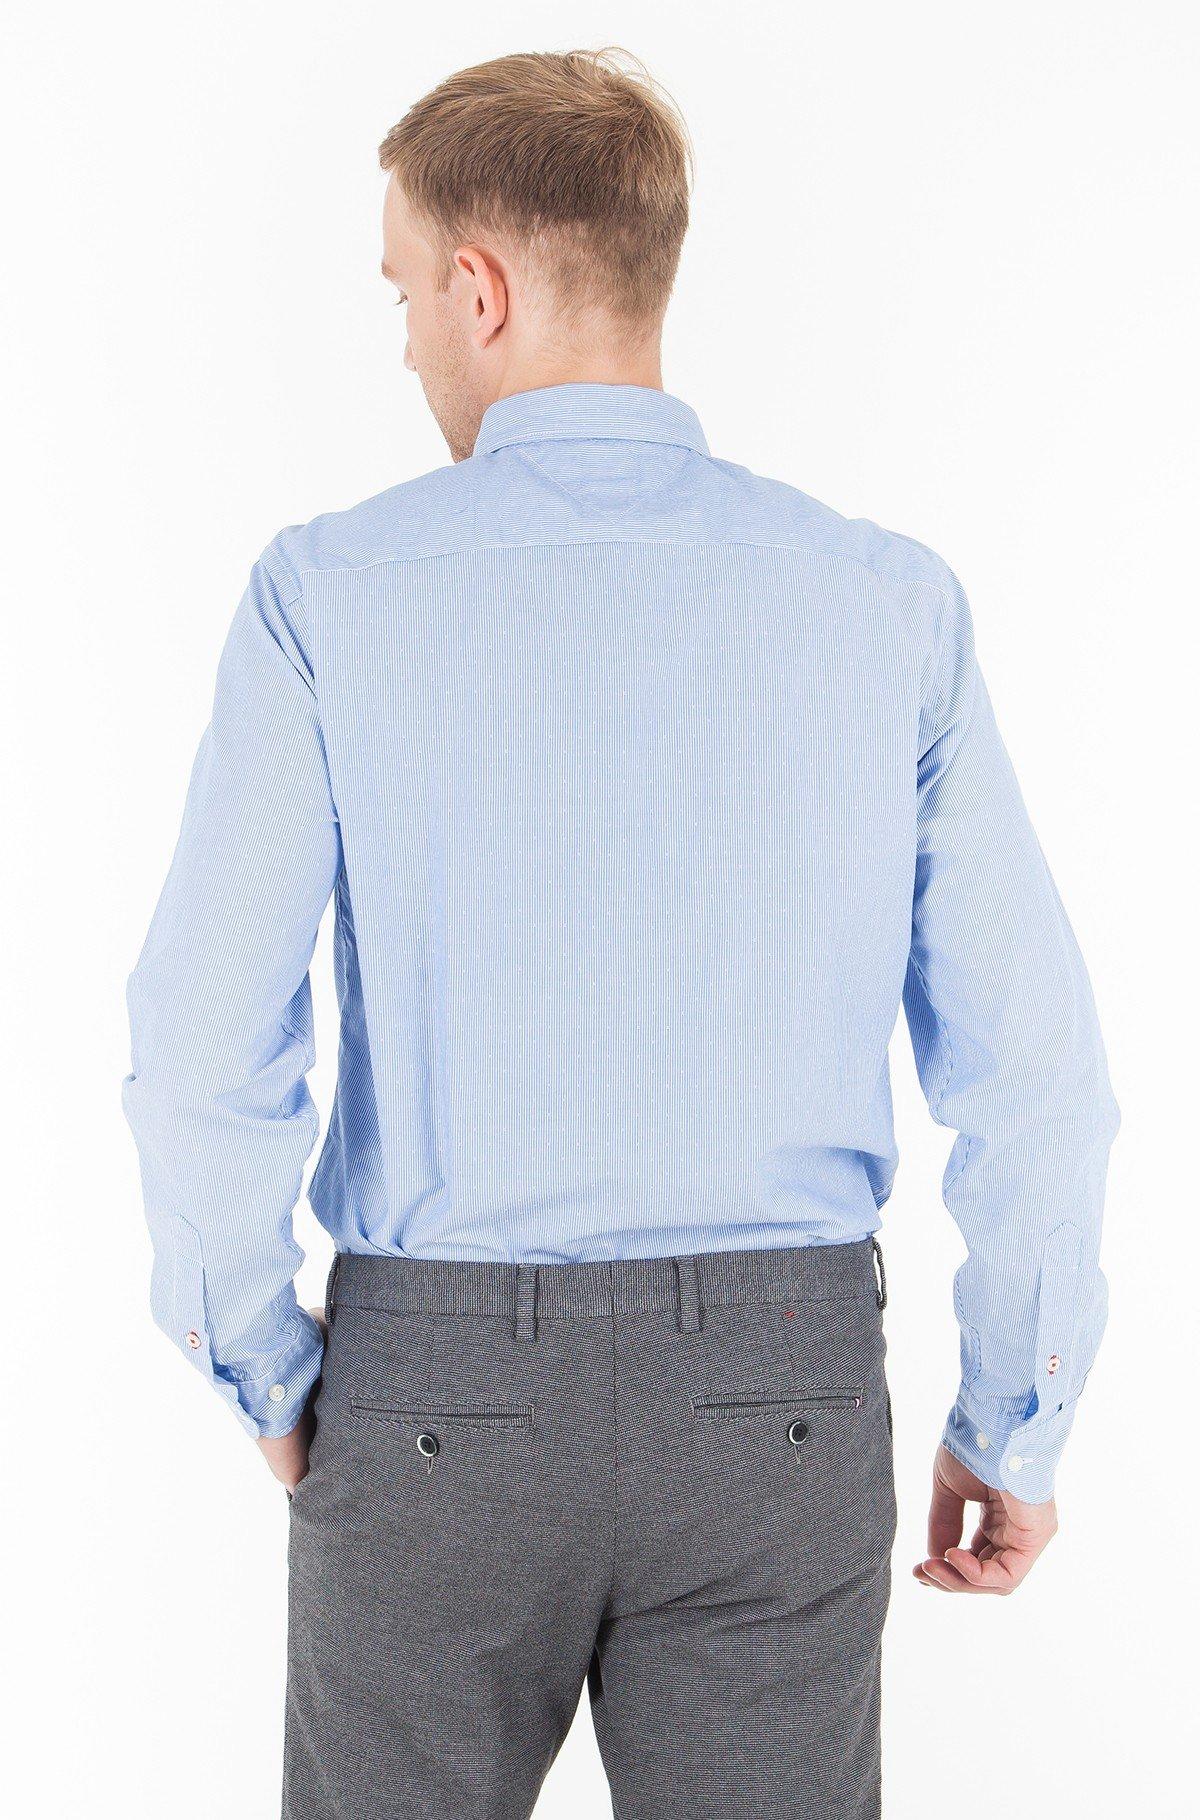 Marškiniai ENGINEERED STRIPED DOBBY SHIRT-full-2